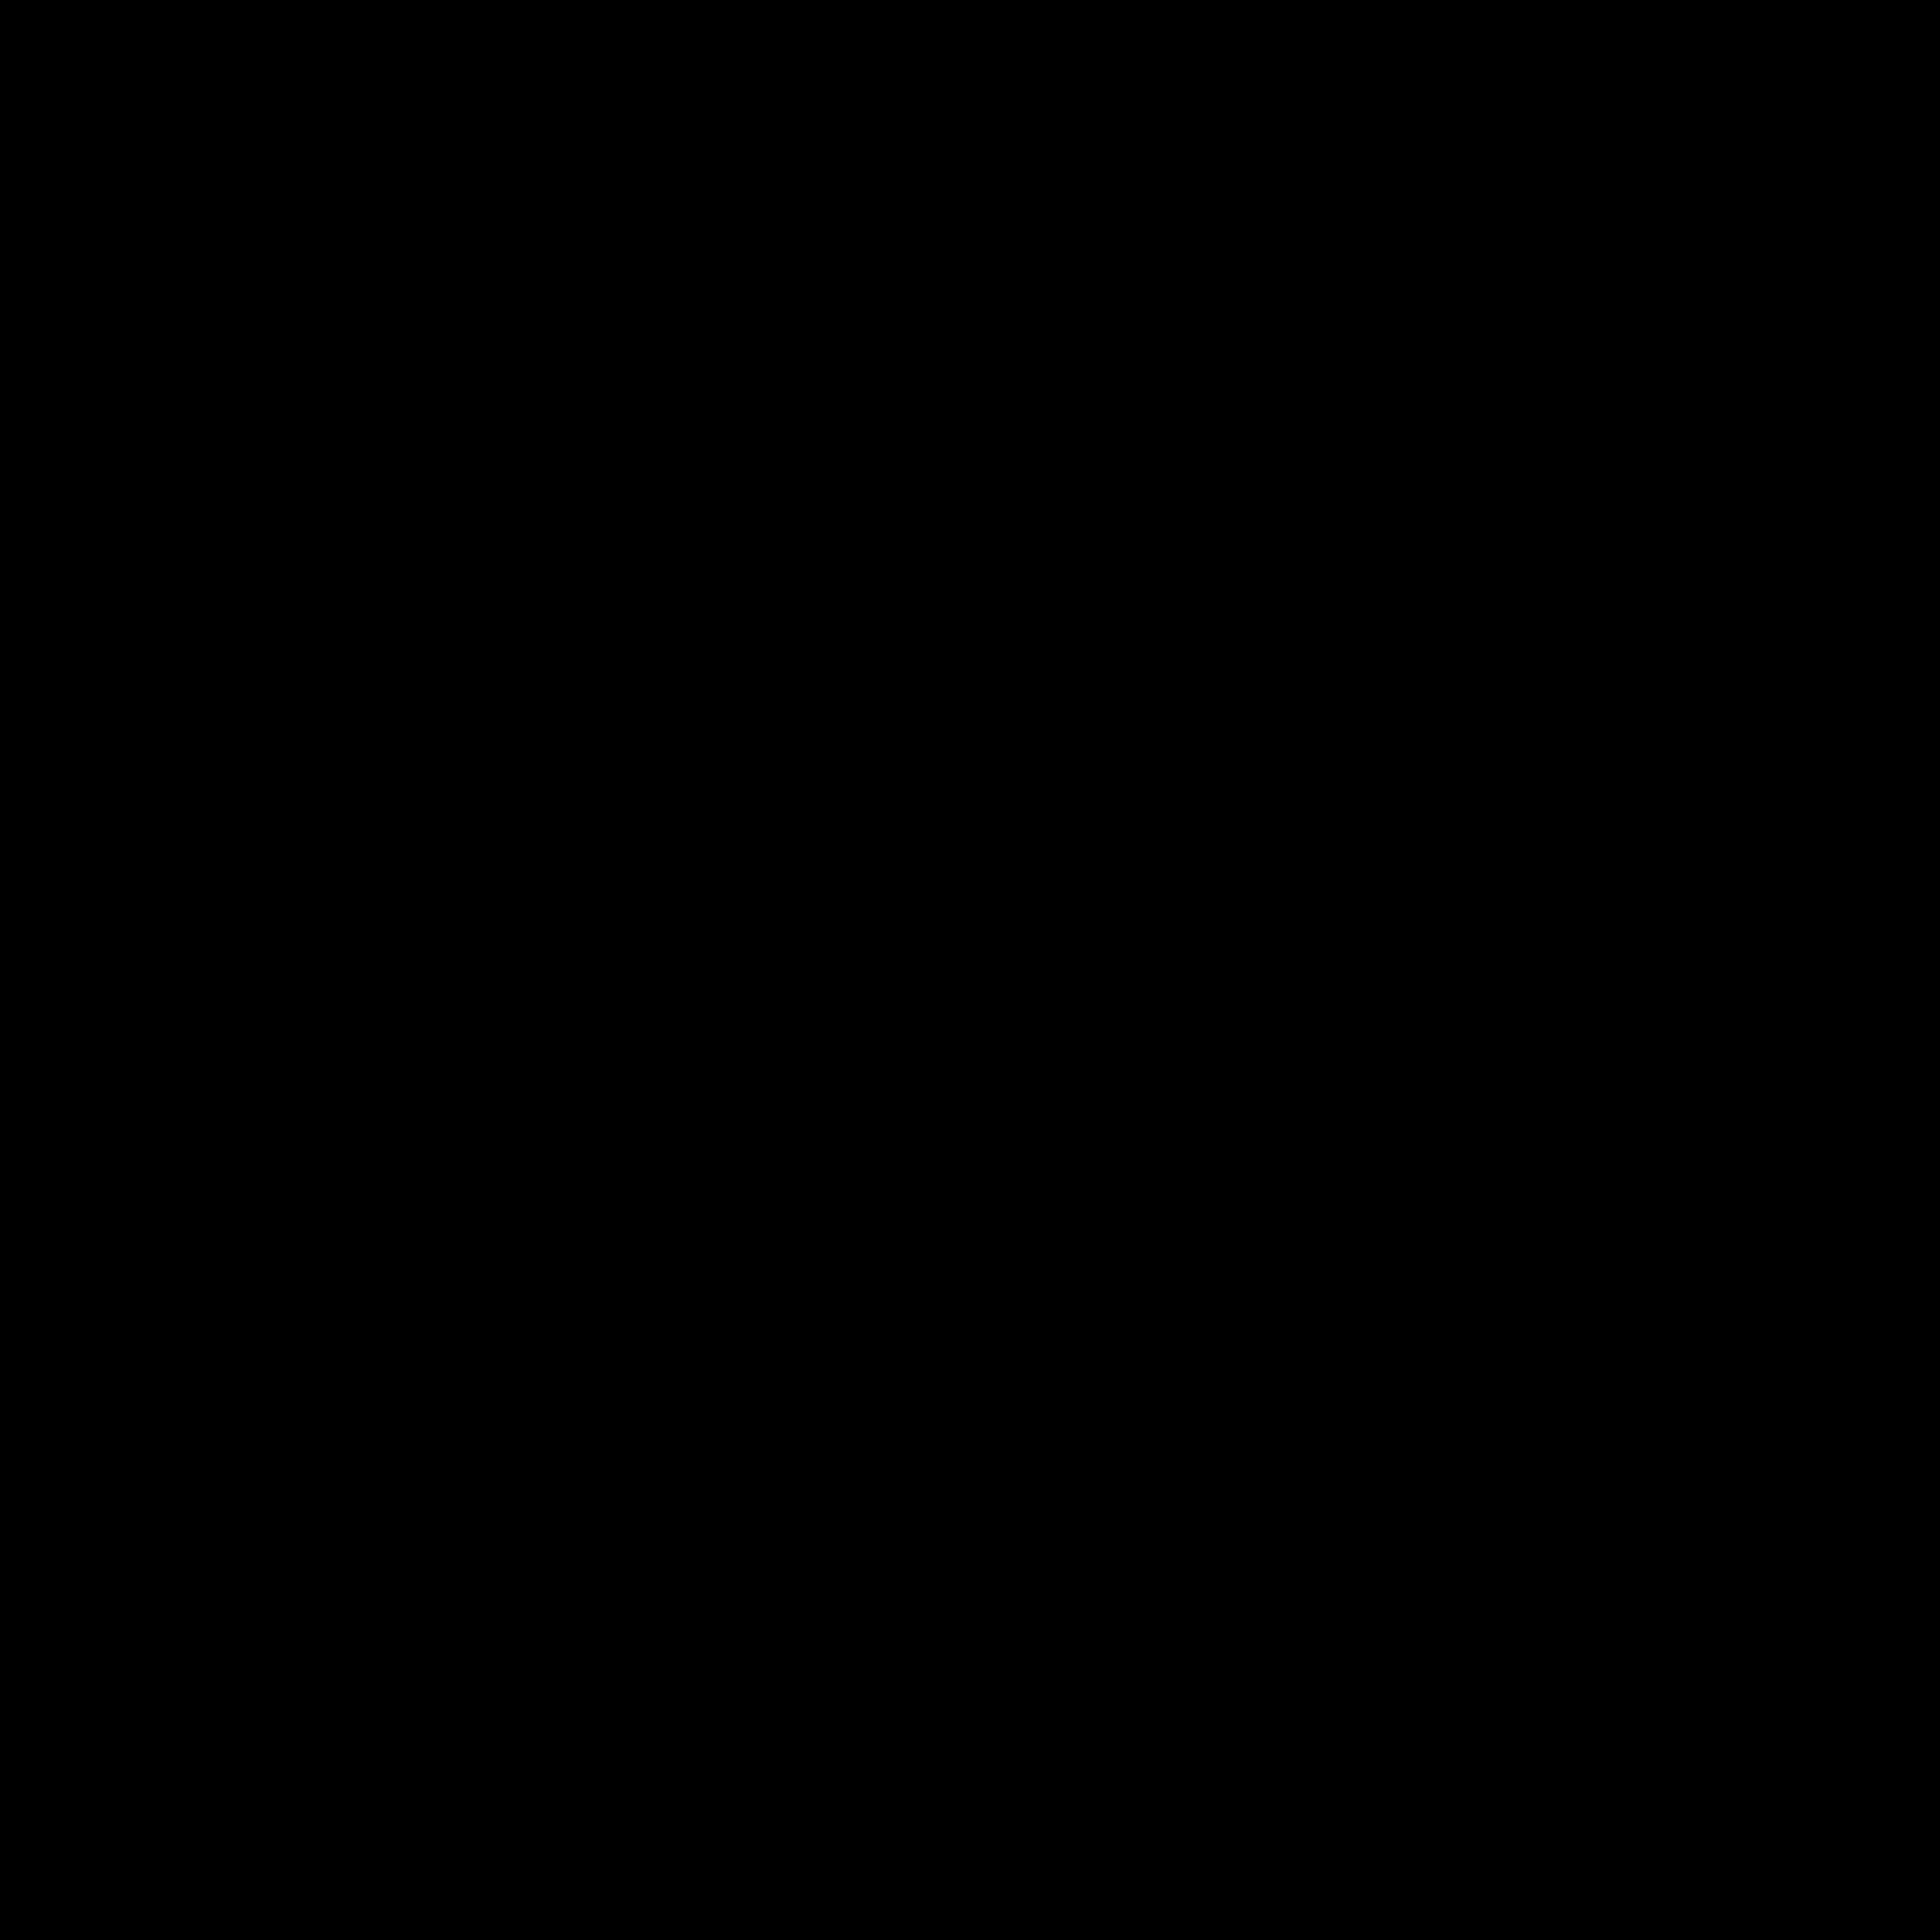 roca-logo-0